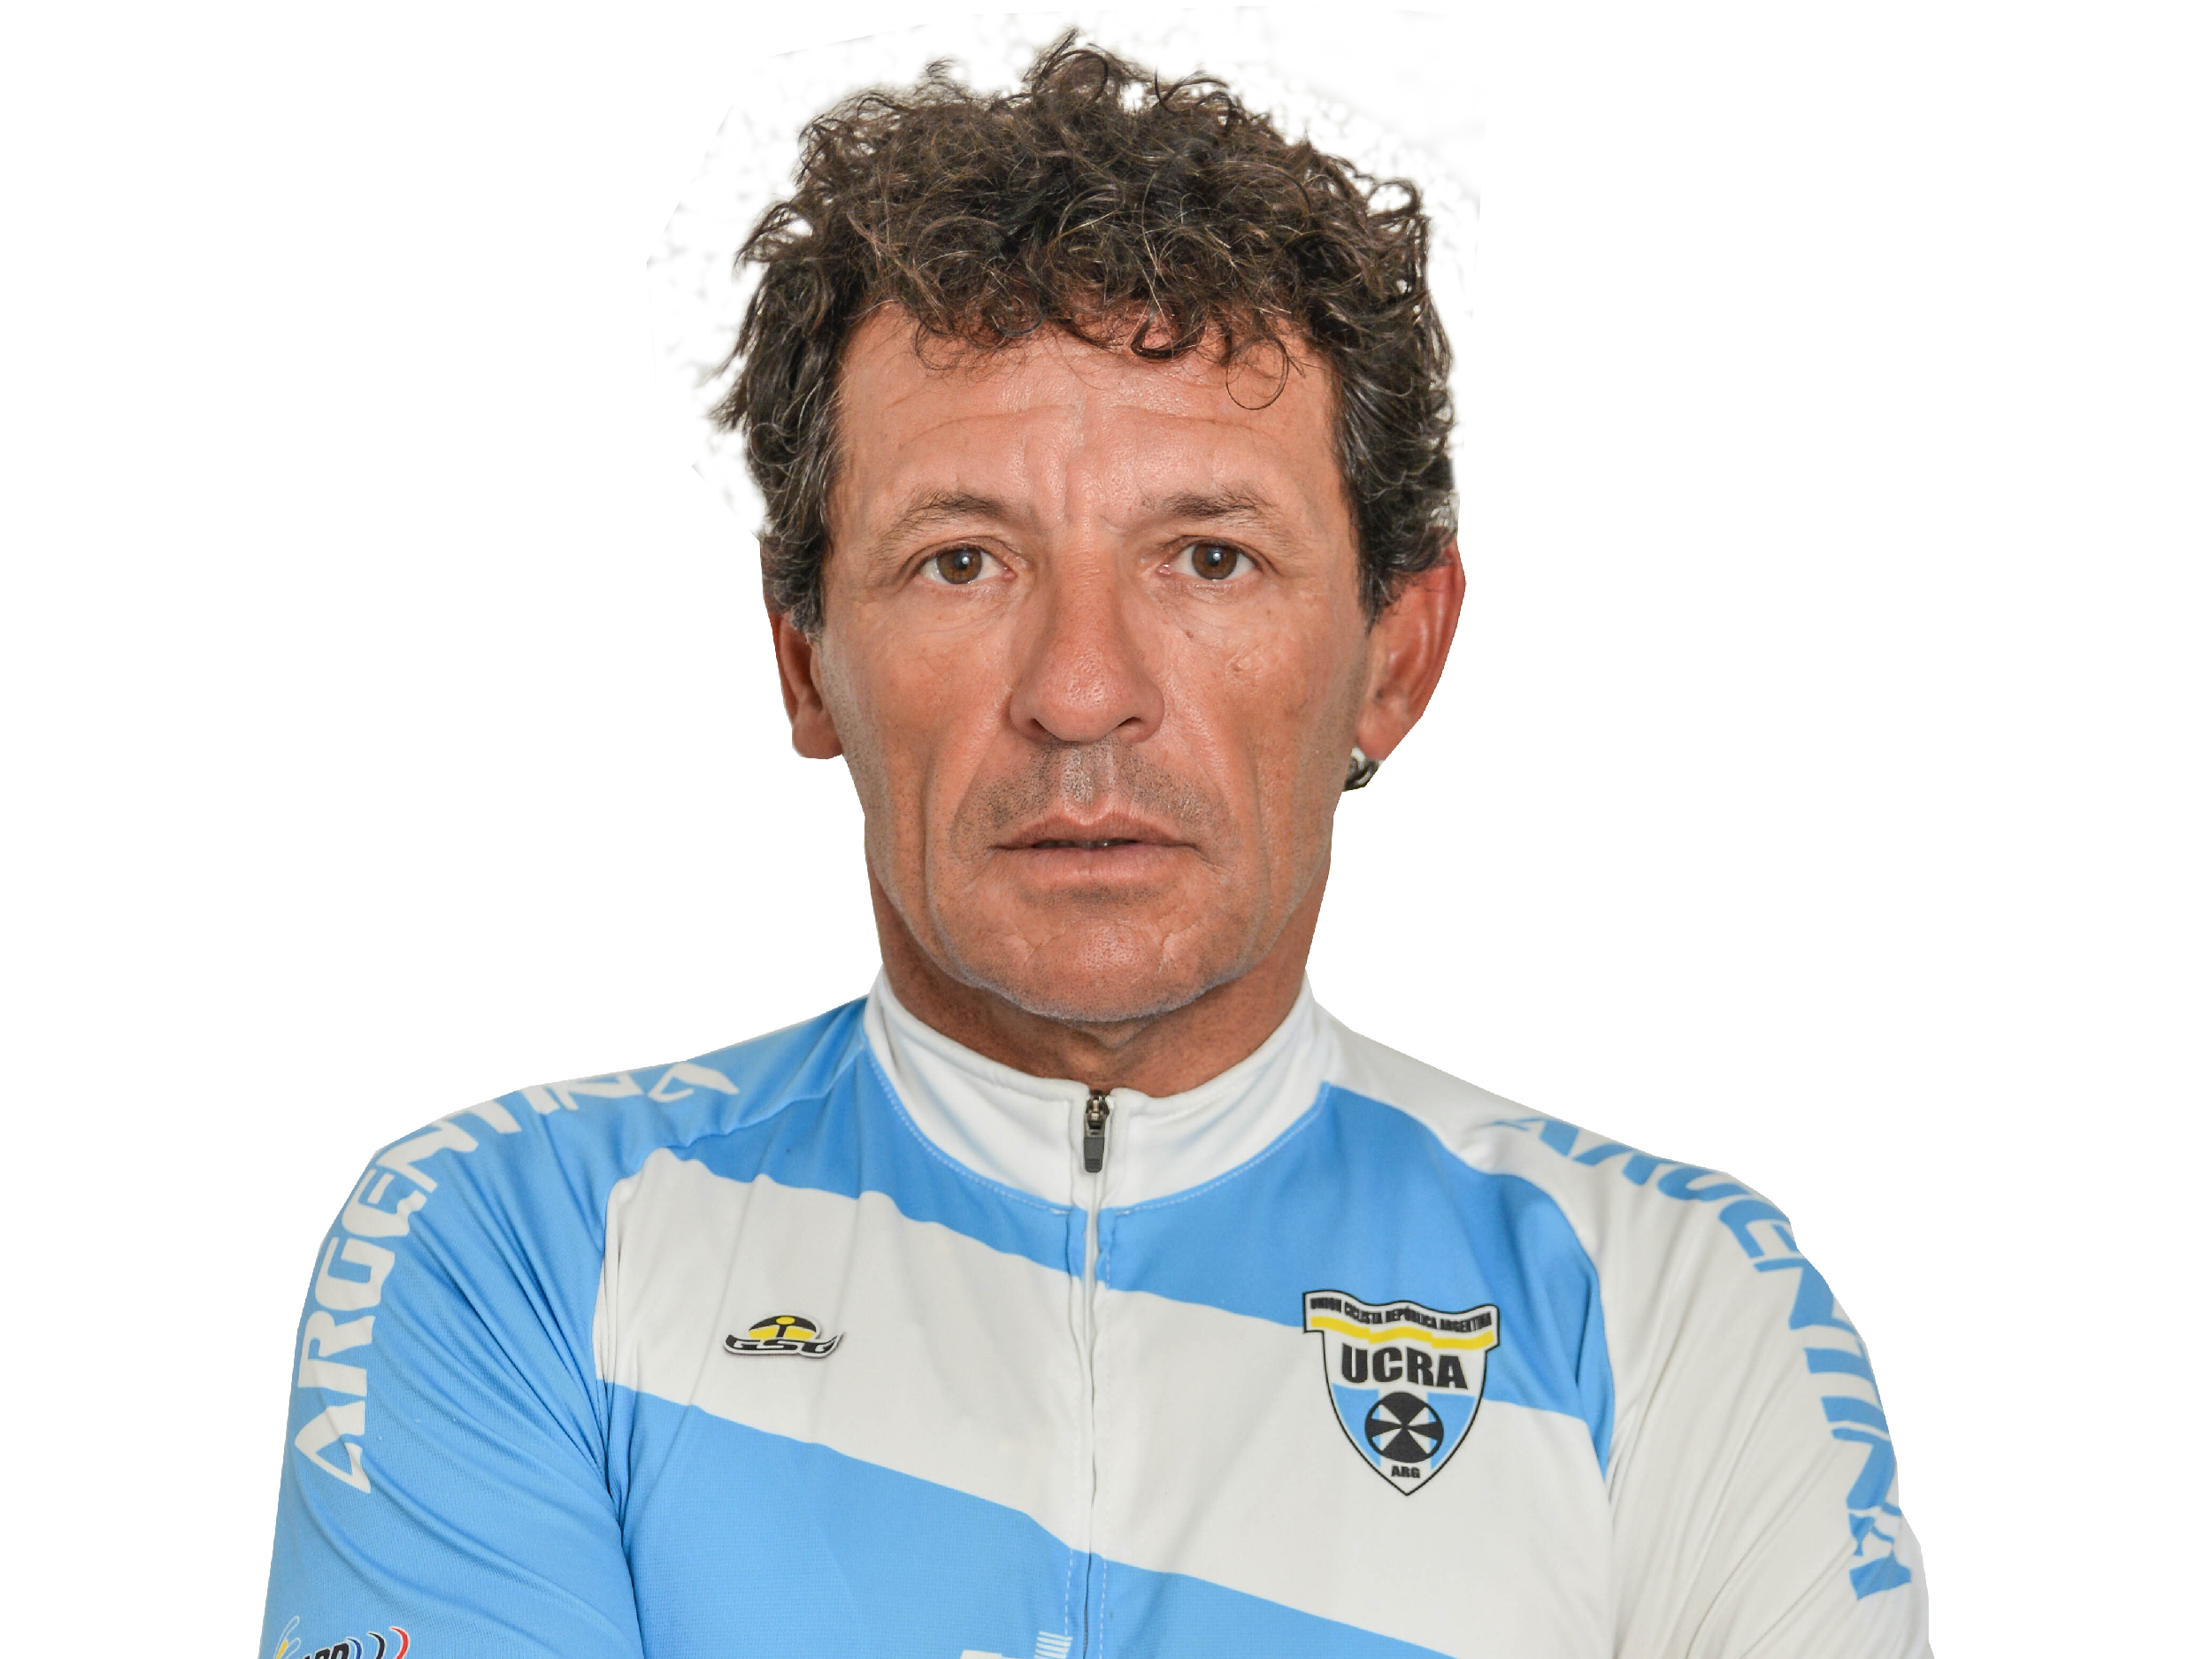 Juan Curuchet - Campeón olímpico de ciclismo Juegos Olímpicos de Pekín 2008.